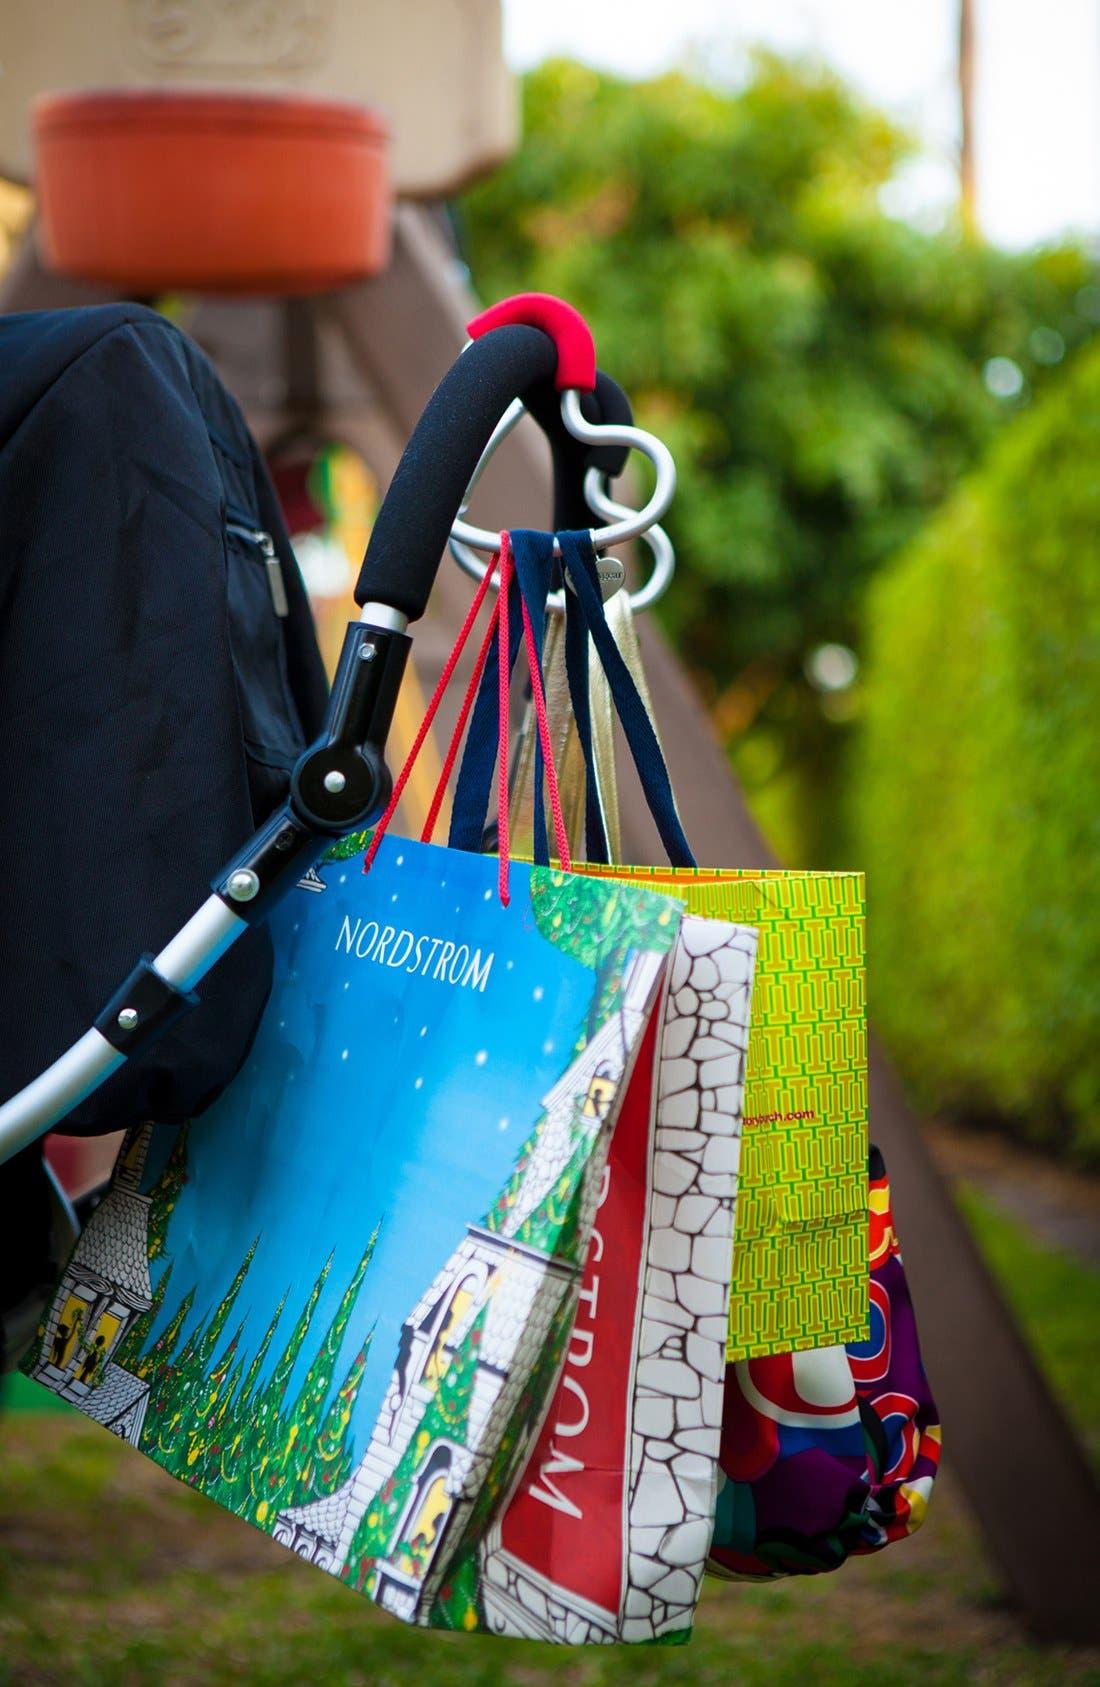 Buggygear 'Buggy Heart Hook' Stroller Bag Hanger,                             Alternate thumbnail 5, color,                             Silver/ Black